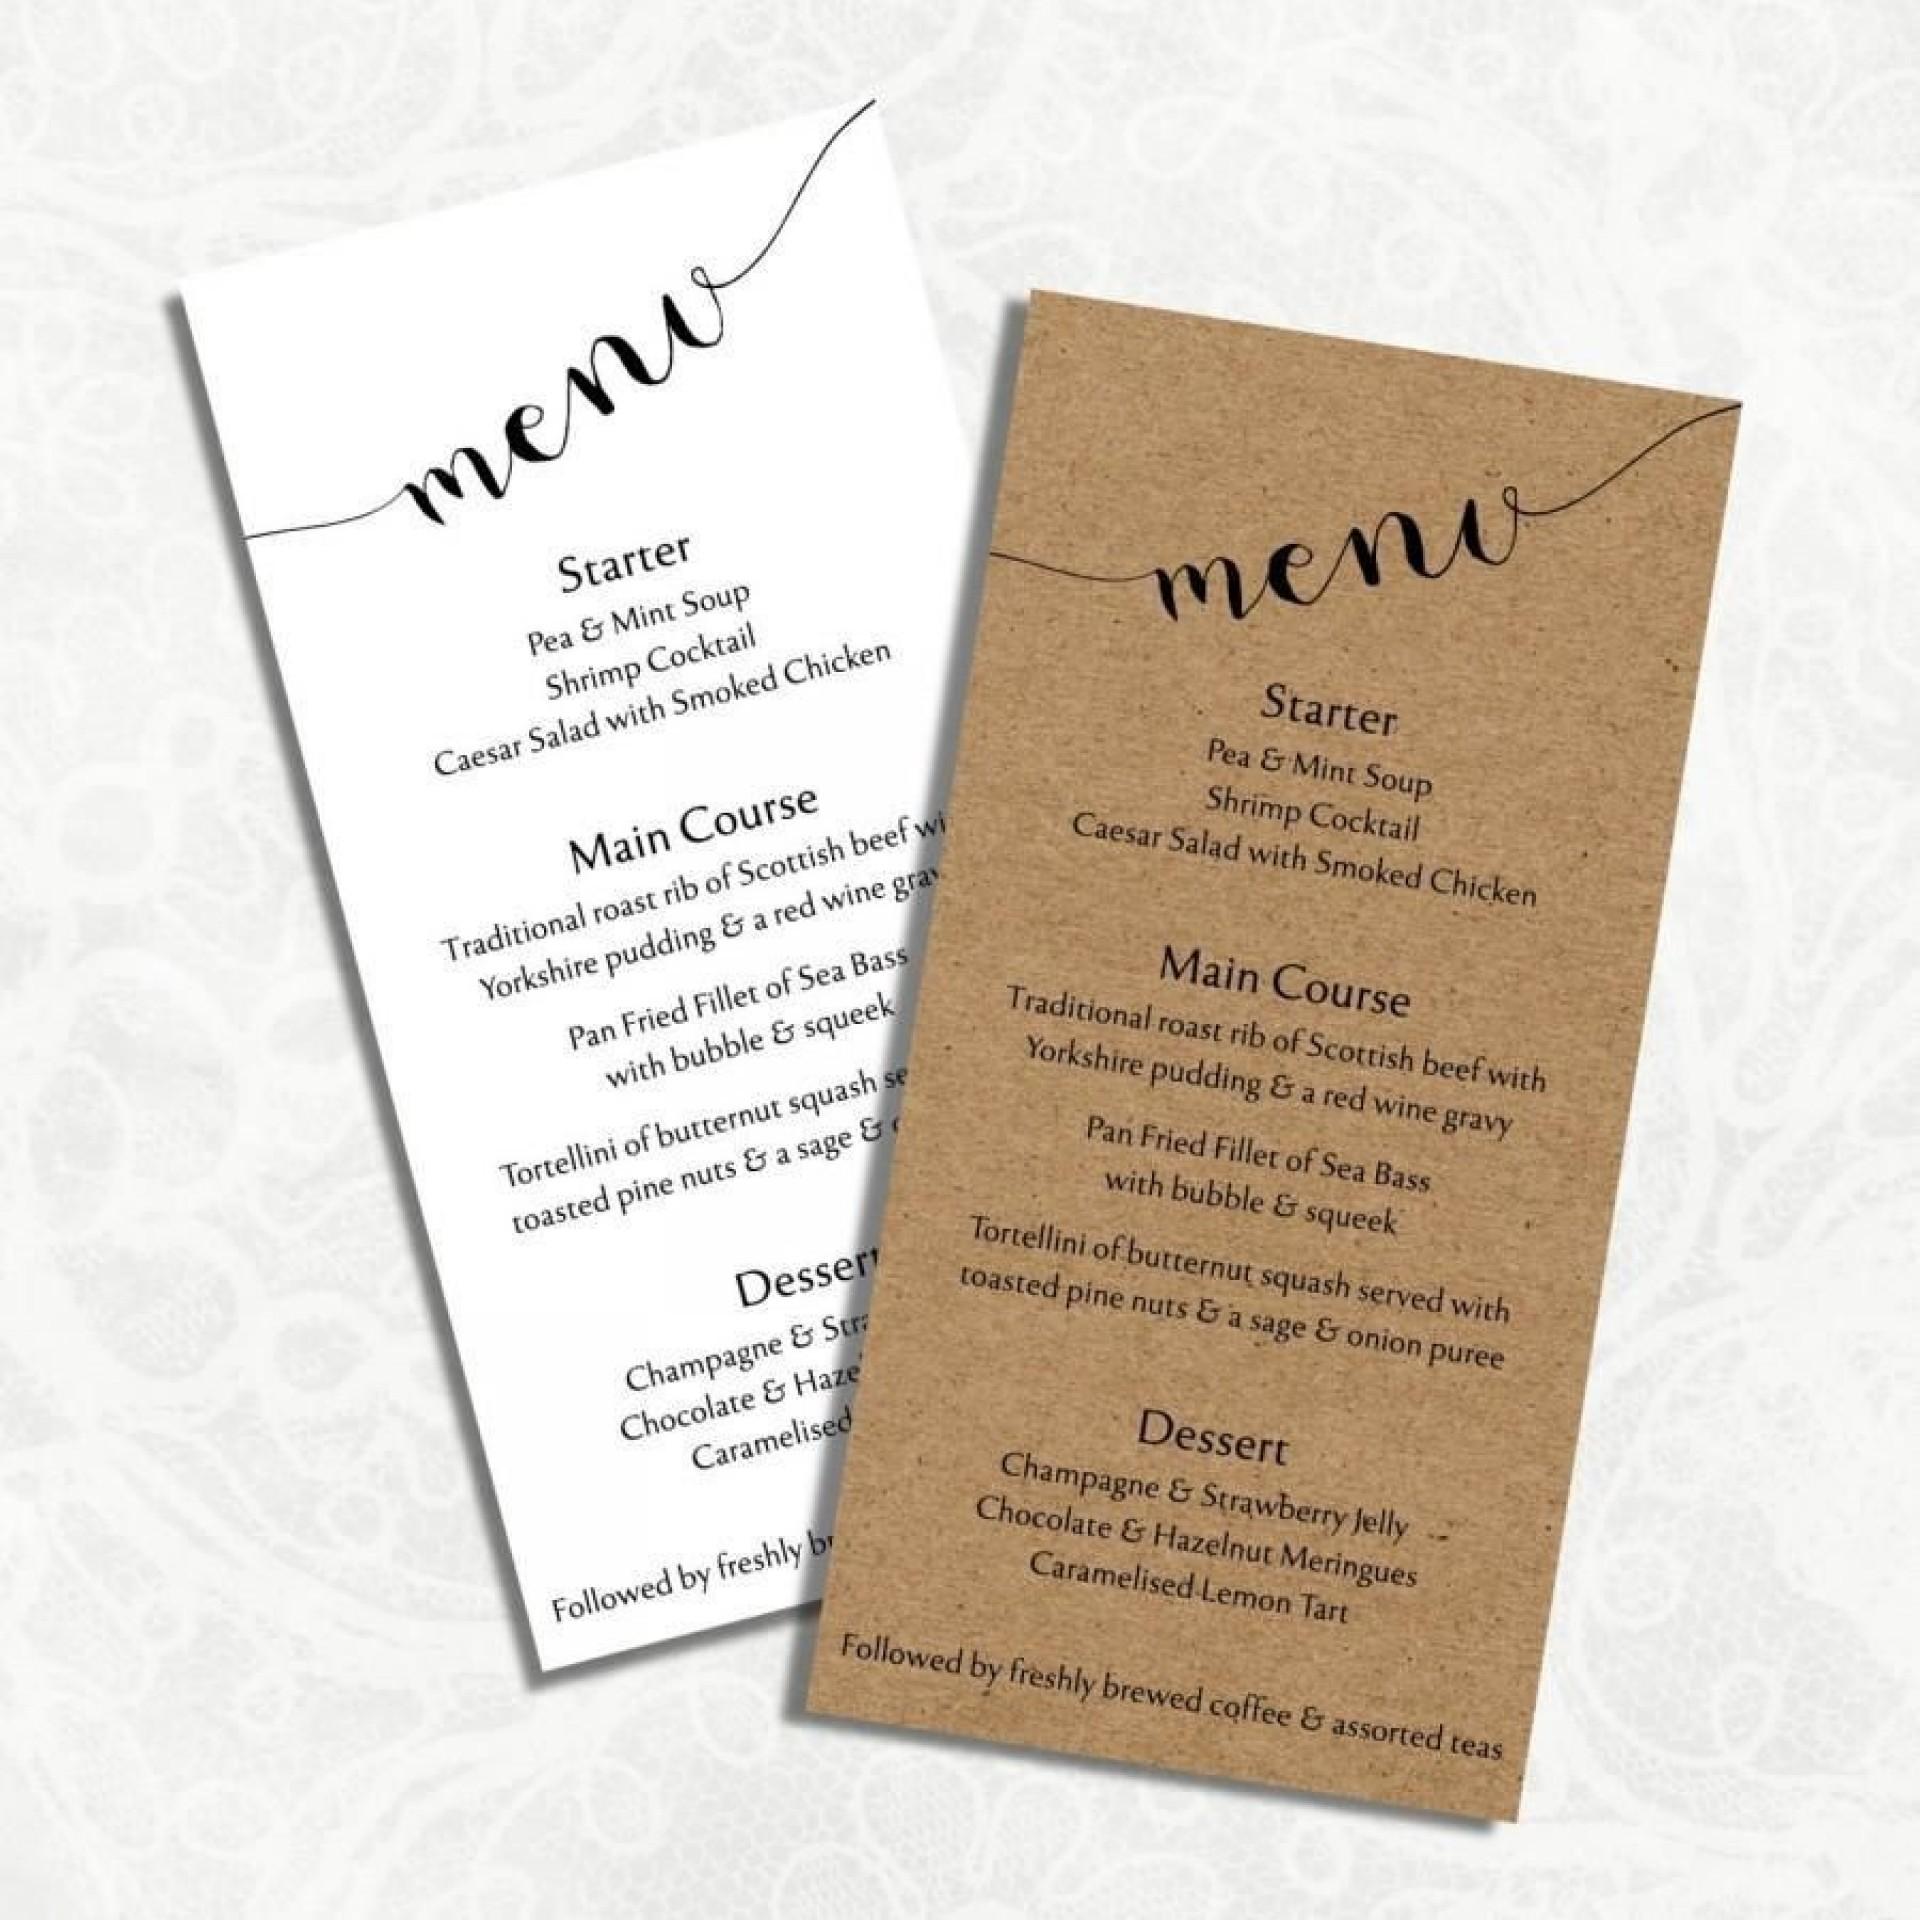 005 Staggering Diy Wedding Menu Template Highest Quality  Free Card1920